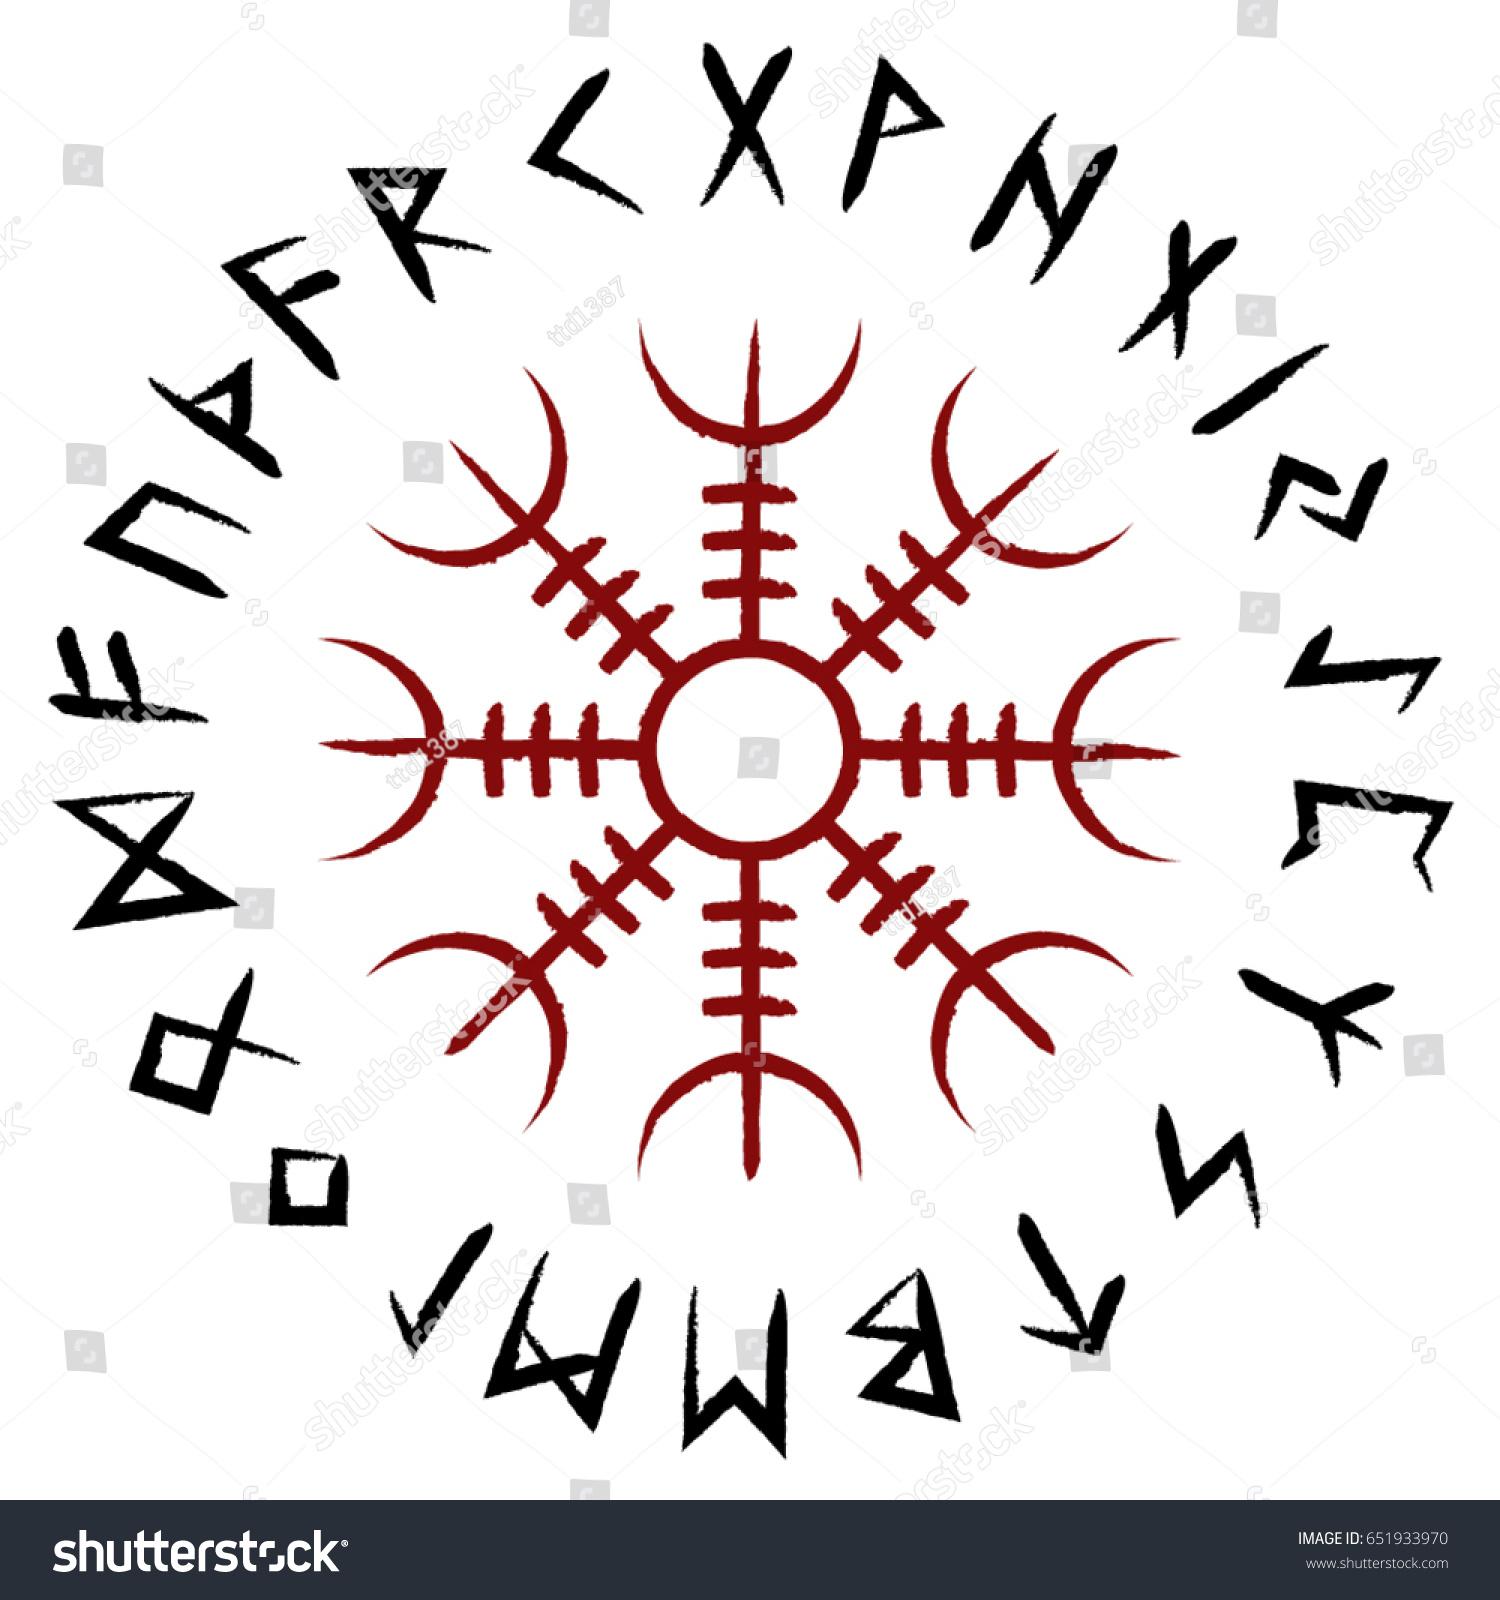 Rune of Shielding Stock-vector-aegishjalmur-symbol-651933970